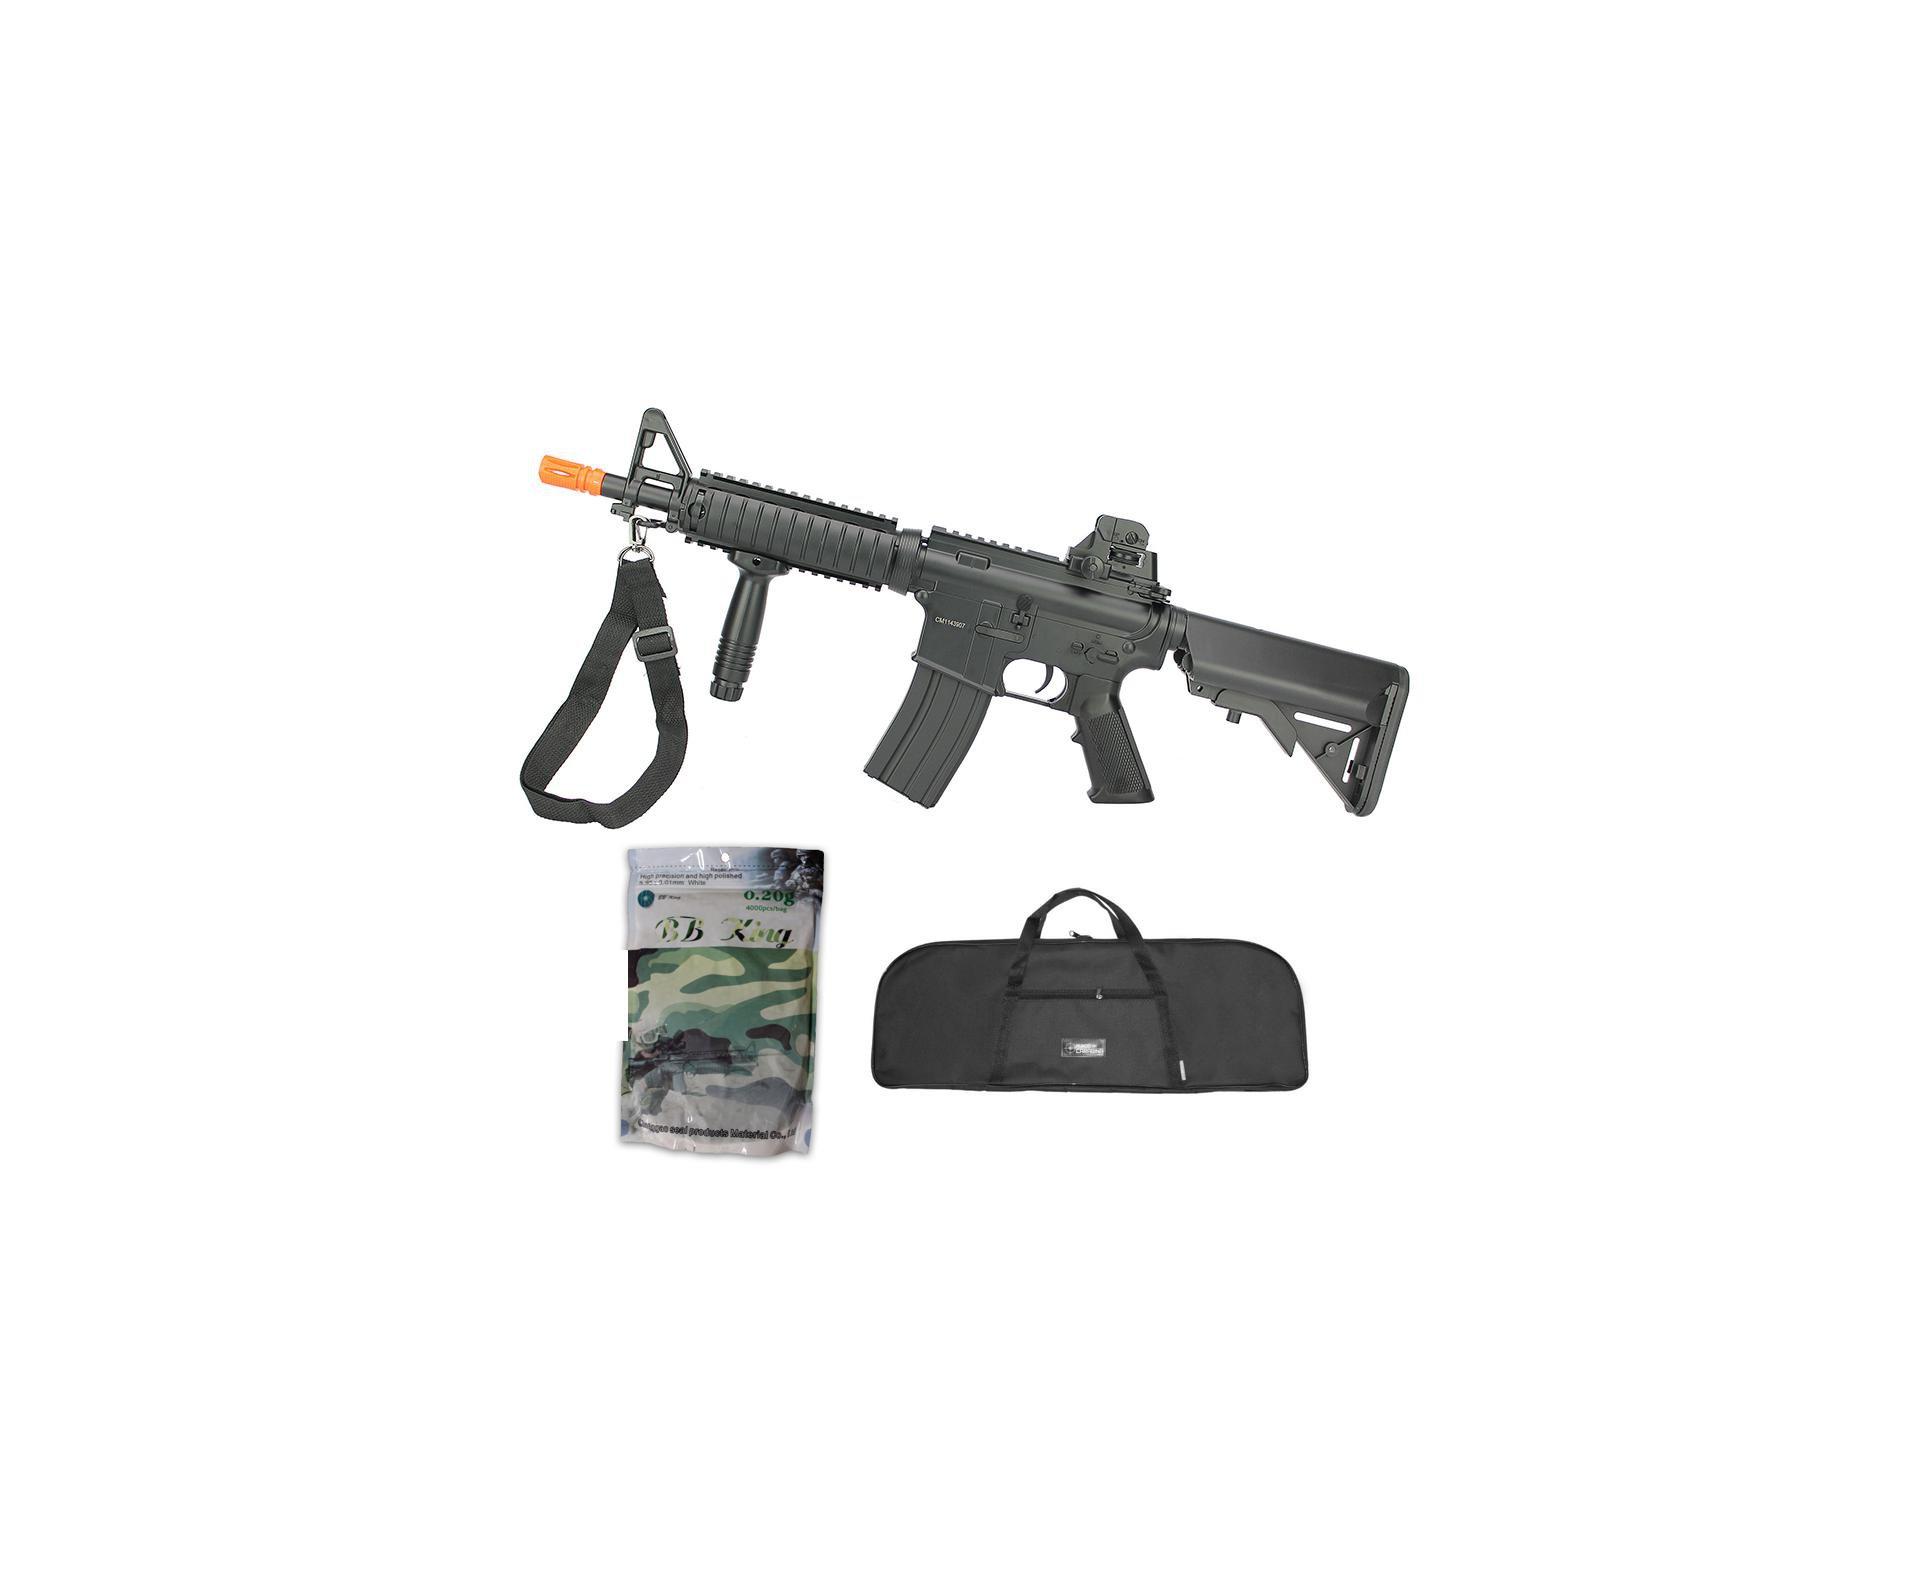 Rifle De Airsoft M4 Ris Cqb Cm176n Aeg Bivolt Cal 6mm - Cyma + Capa Simples + Esfera Plastica 0,20g 4000uni